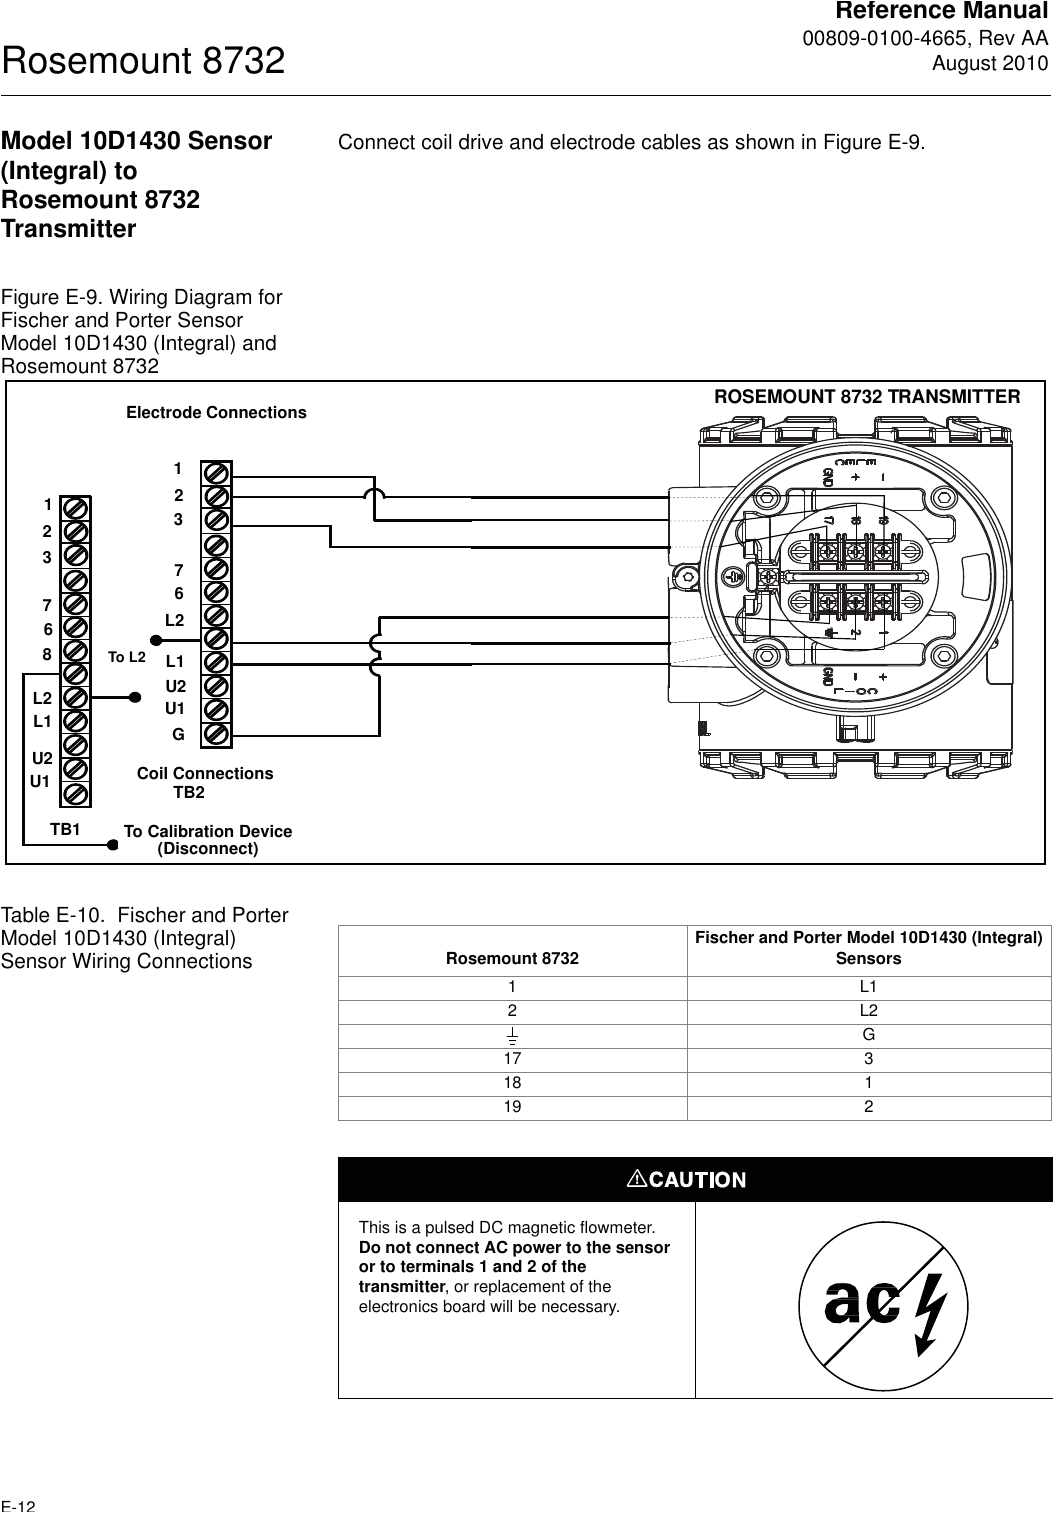 emersonrosemount8732usersmanual165675 30137492 user guide page 138 png